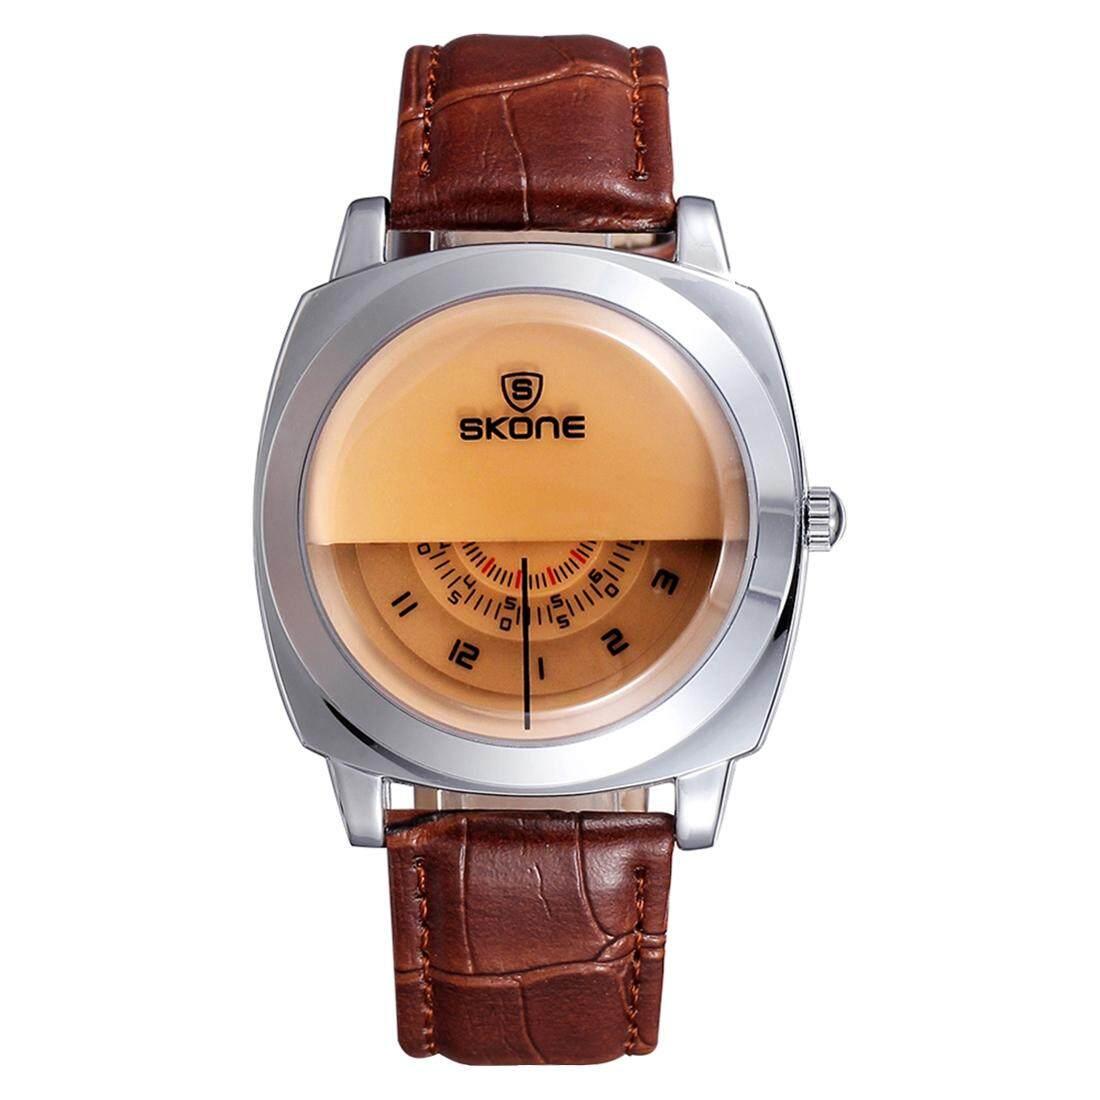 Skone Fashion Cool Men Watch 3 Dial 1 H/Min/S Hand Quartz Analog Wristwatch